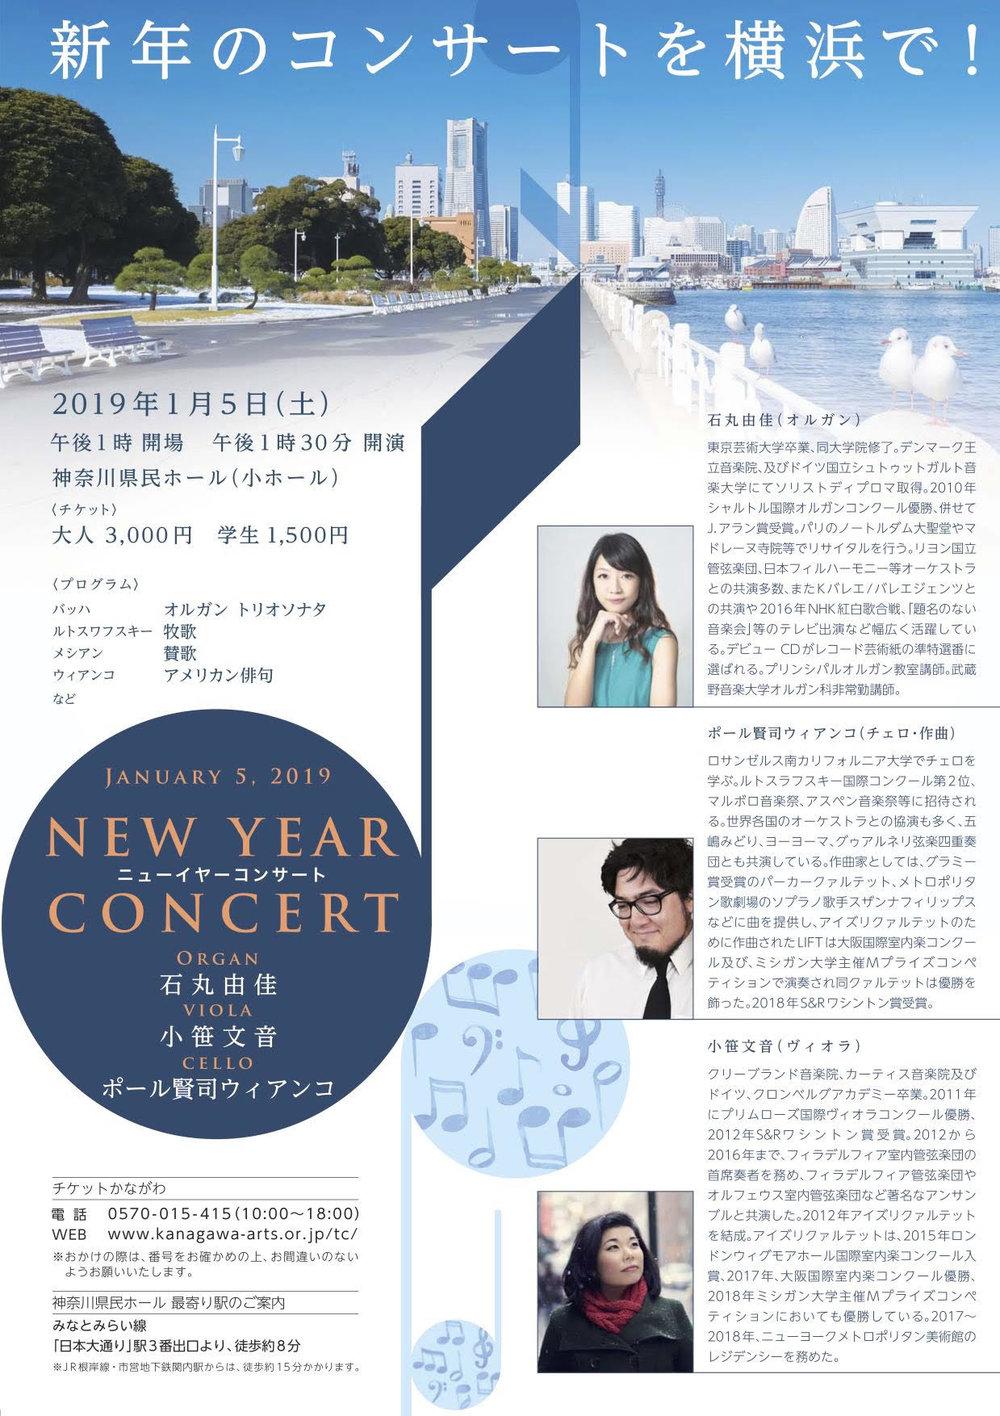 New Year Concert Japan Poster.jpg